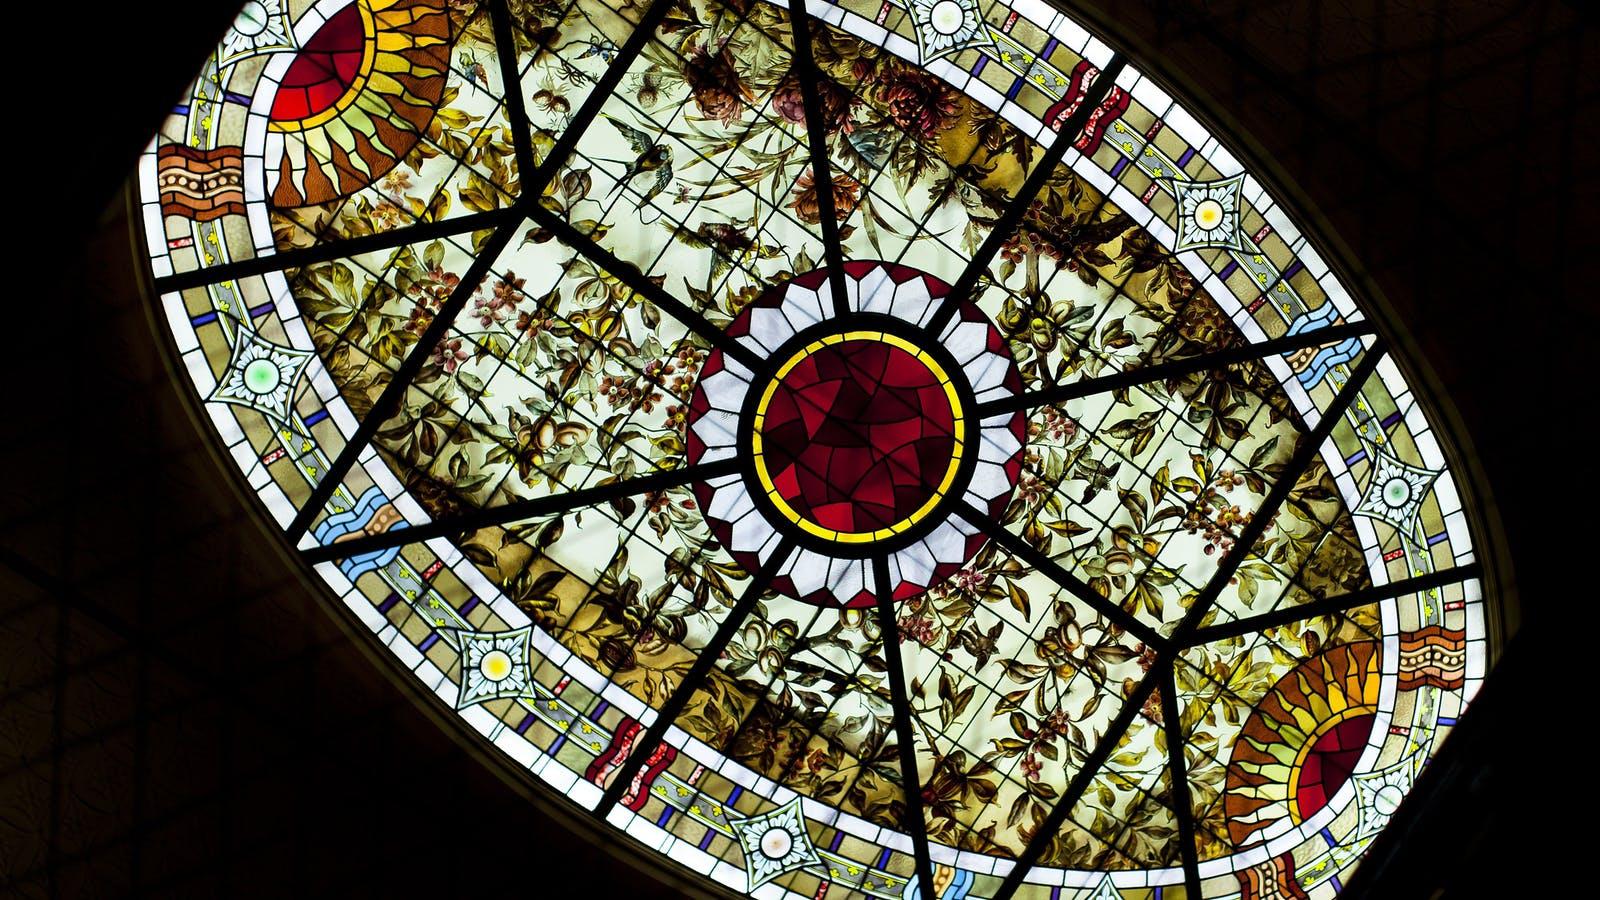 Stained glass at Bundoora Homestead